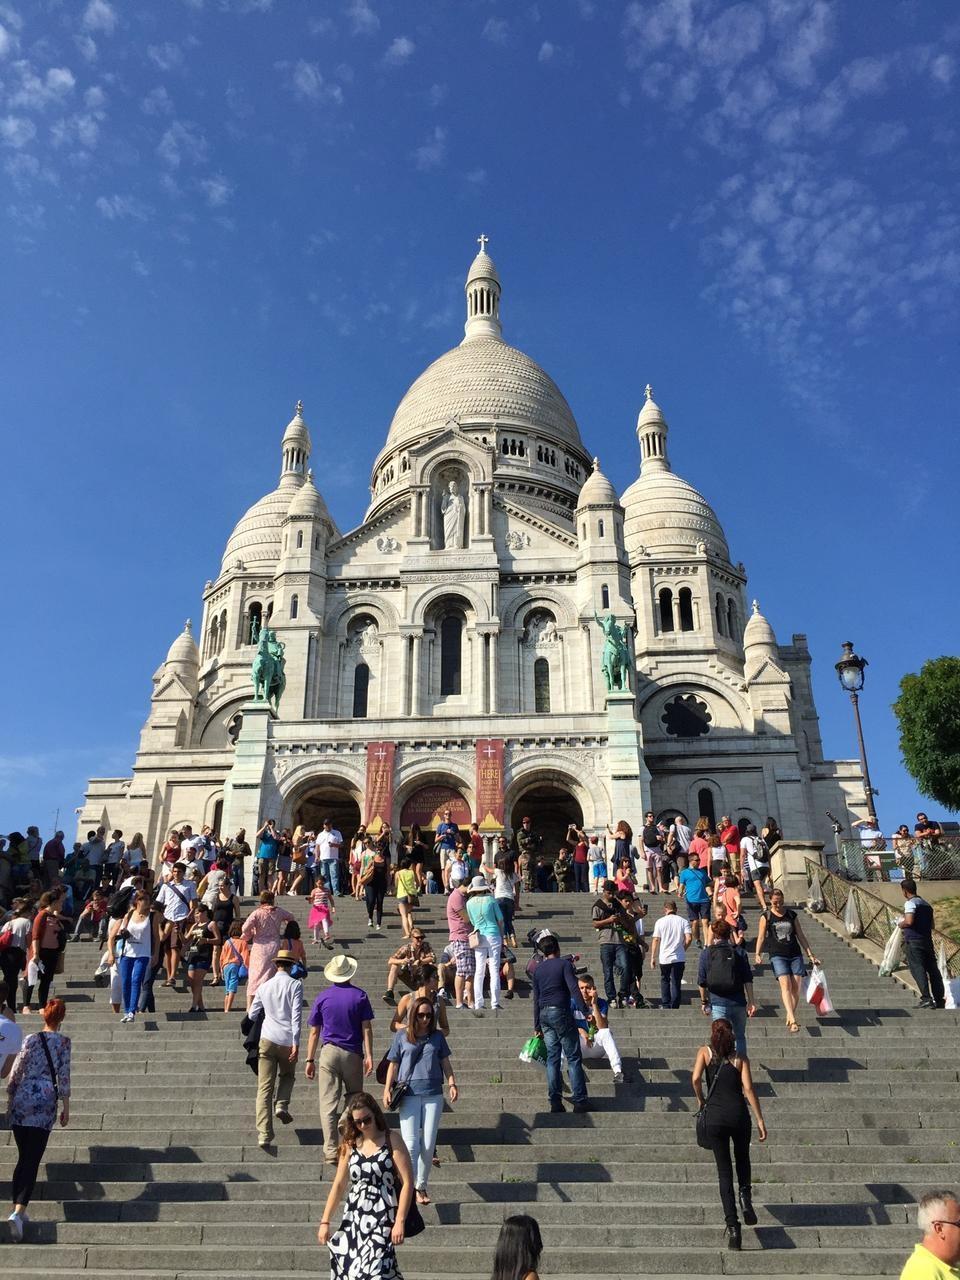 Paris Sacre Coeur Bazilikası